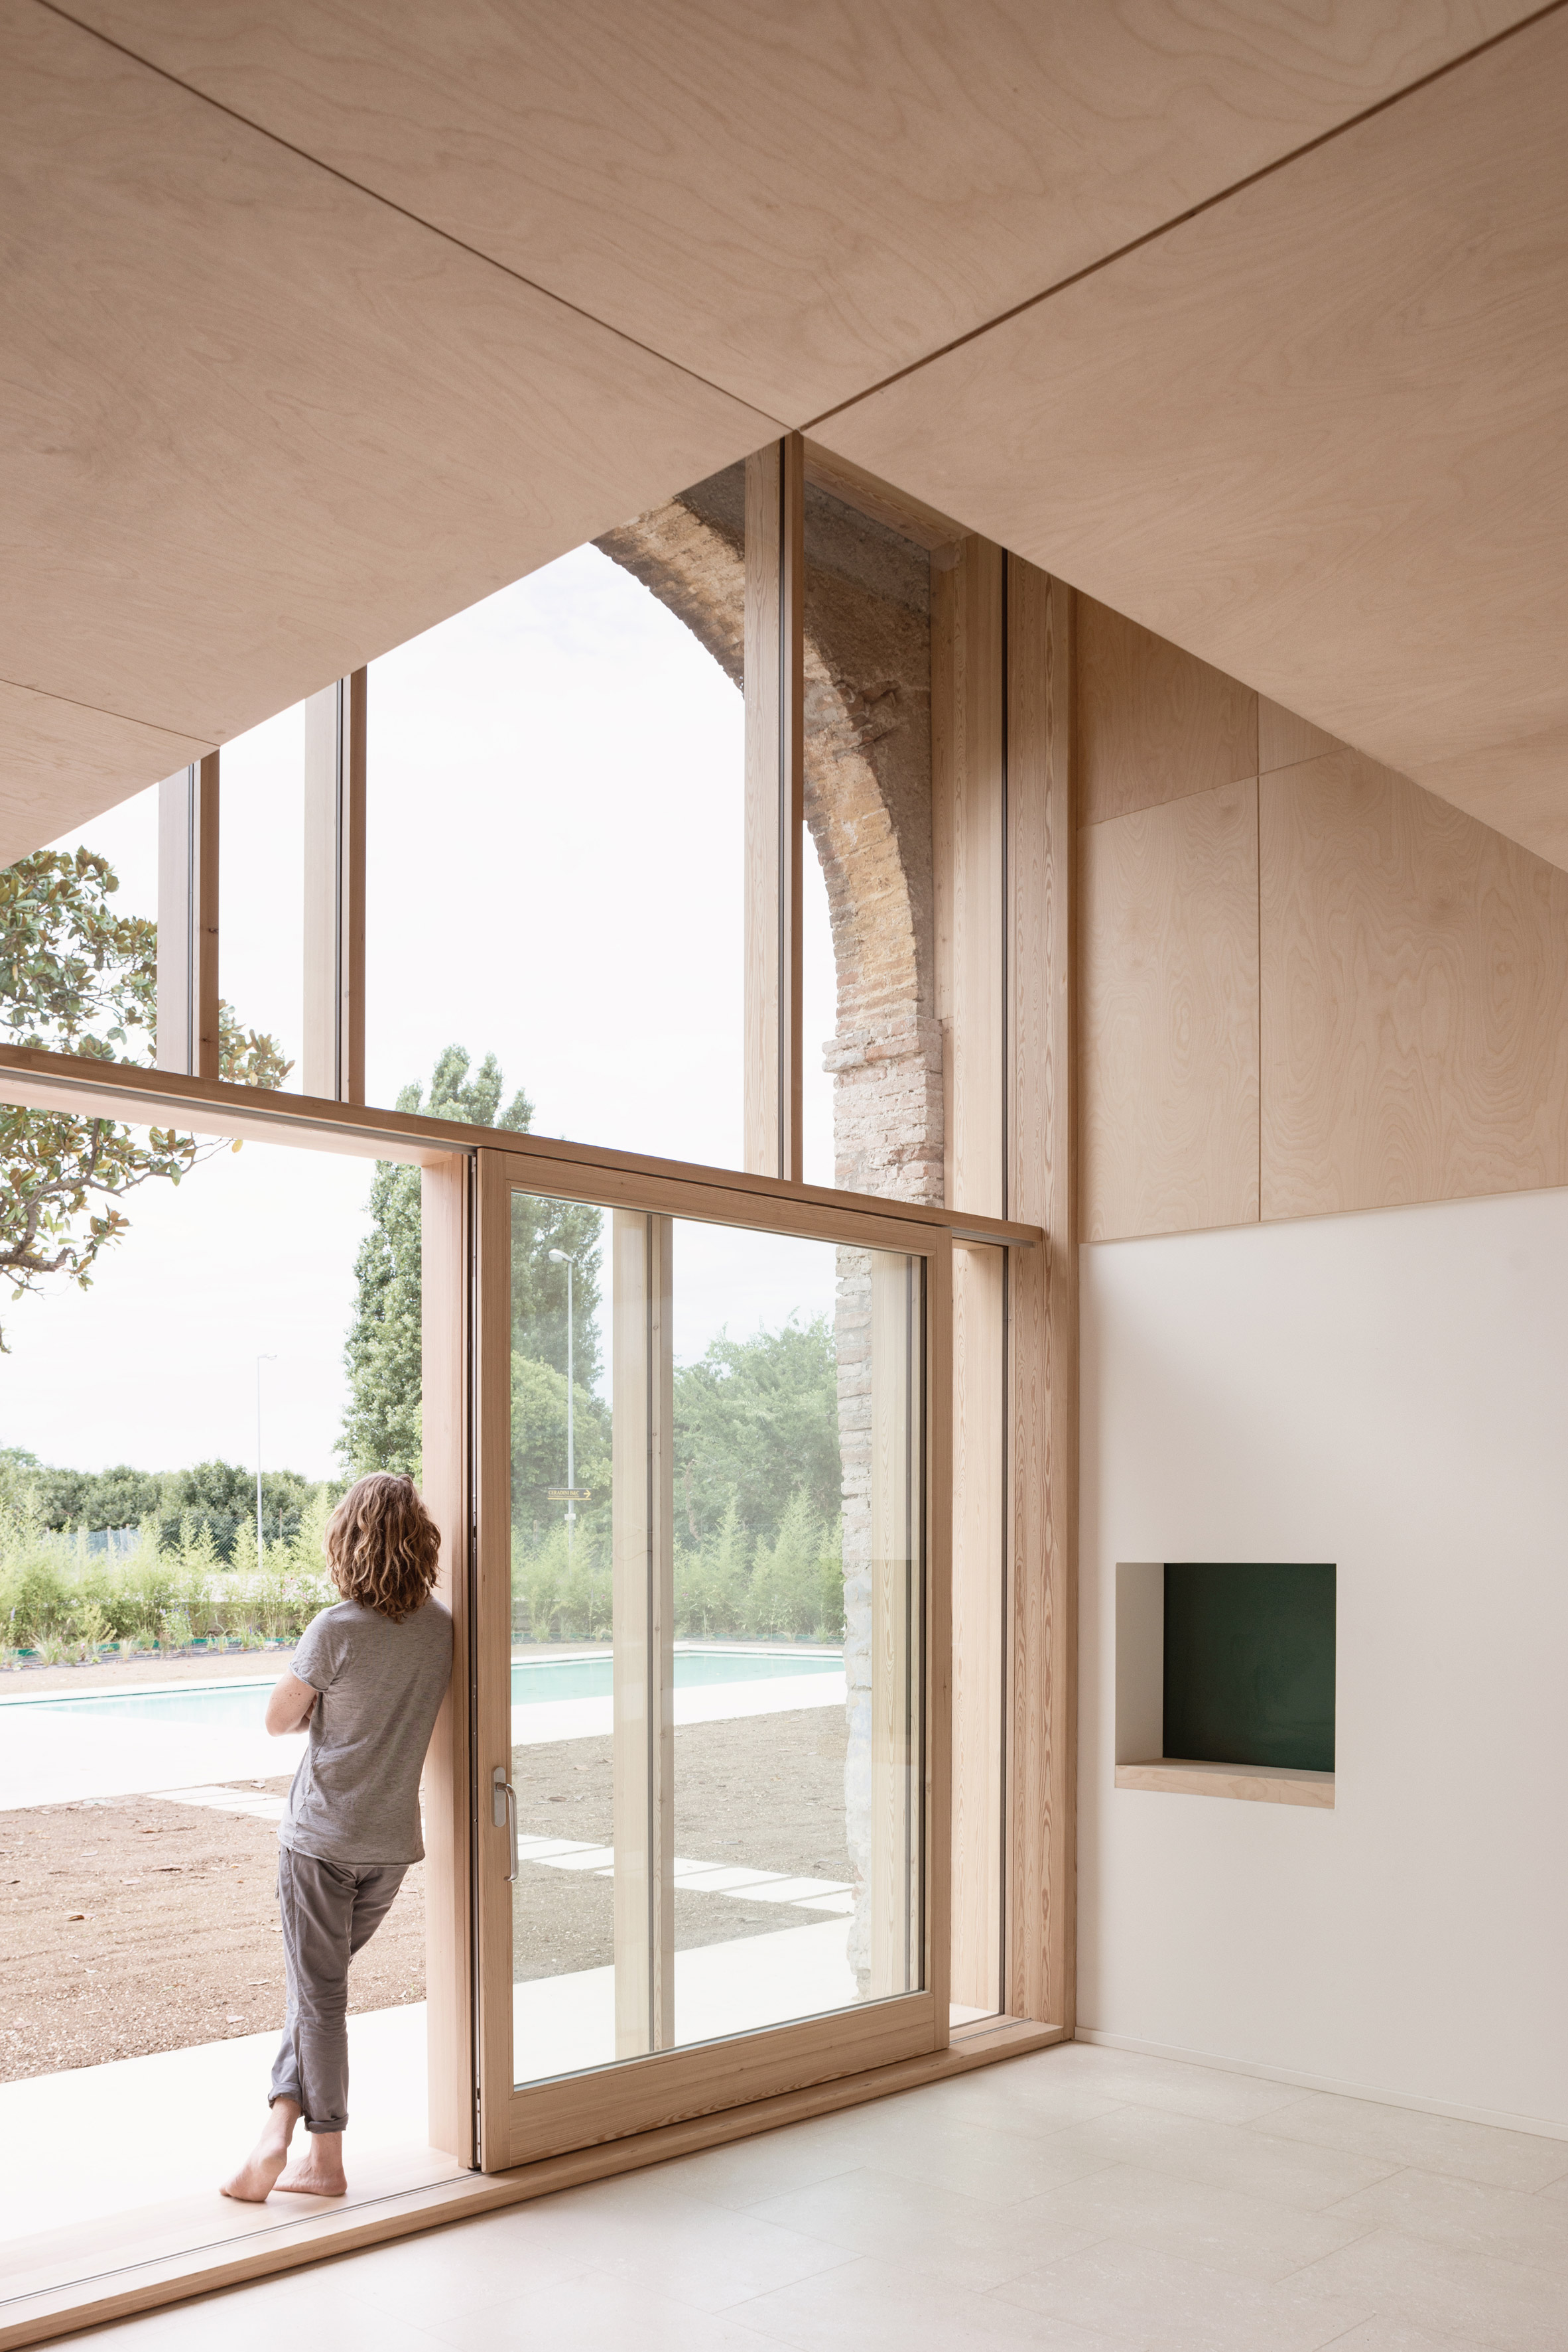 Country home in Chievo, Verona by Studio Wok